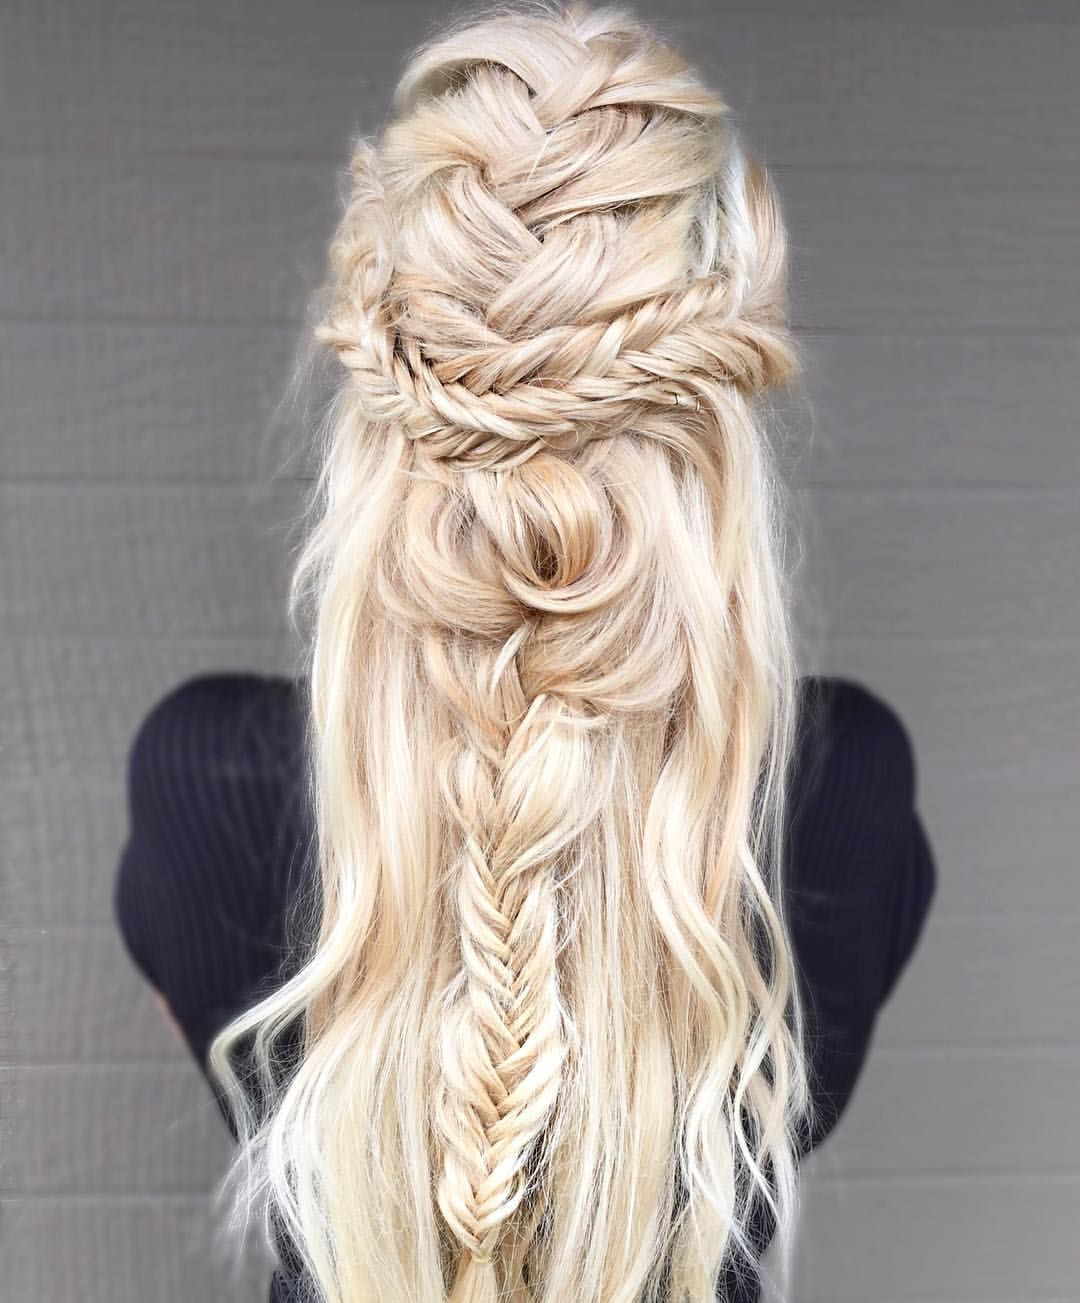 ☪pinterest → frenchfangirl ☼ | wedding ideas | hair